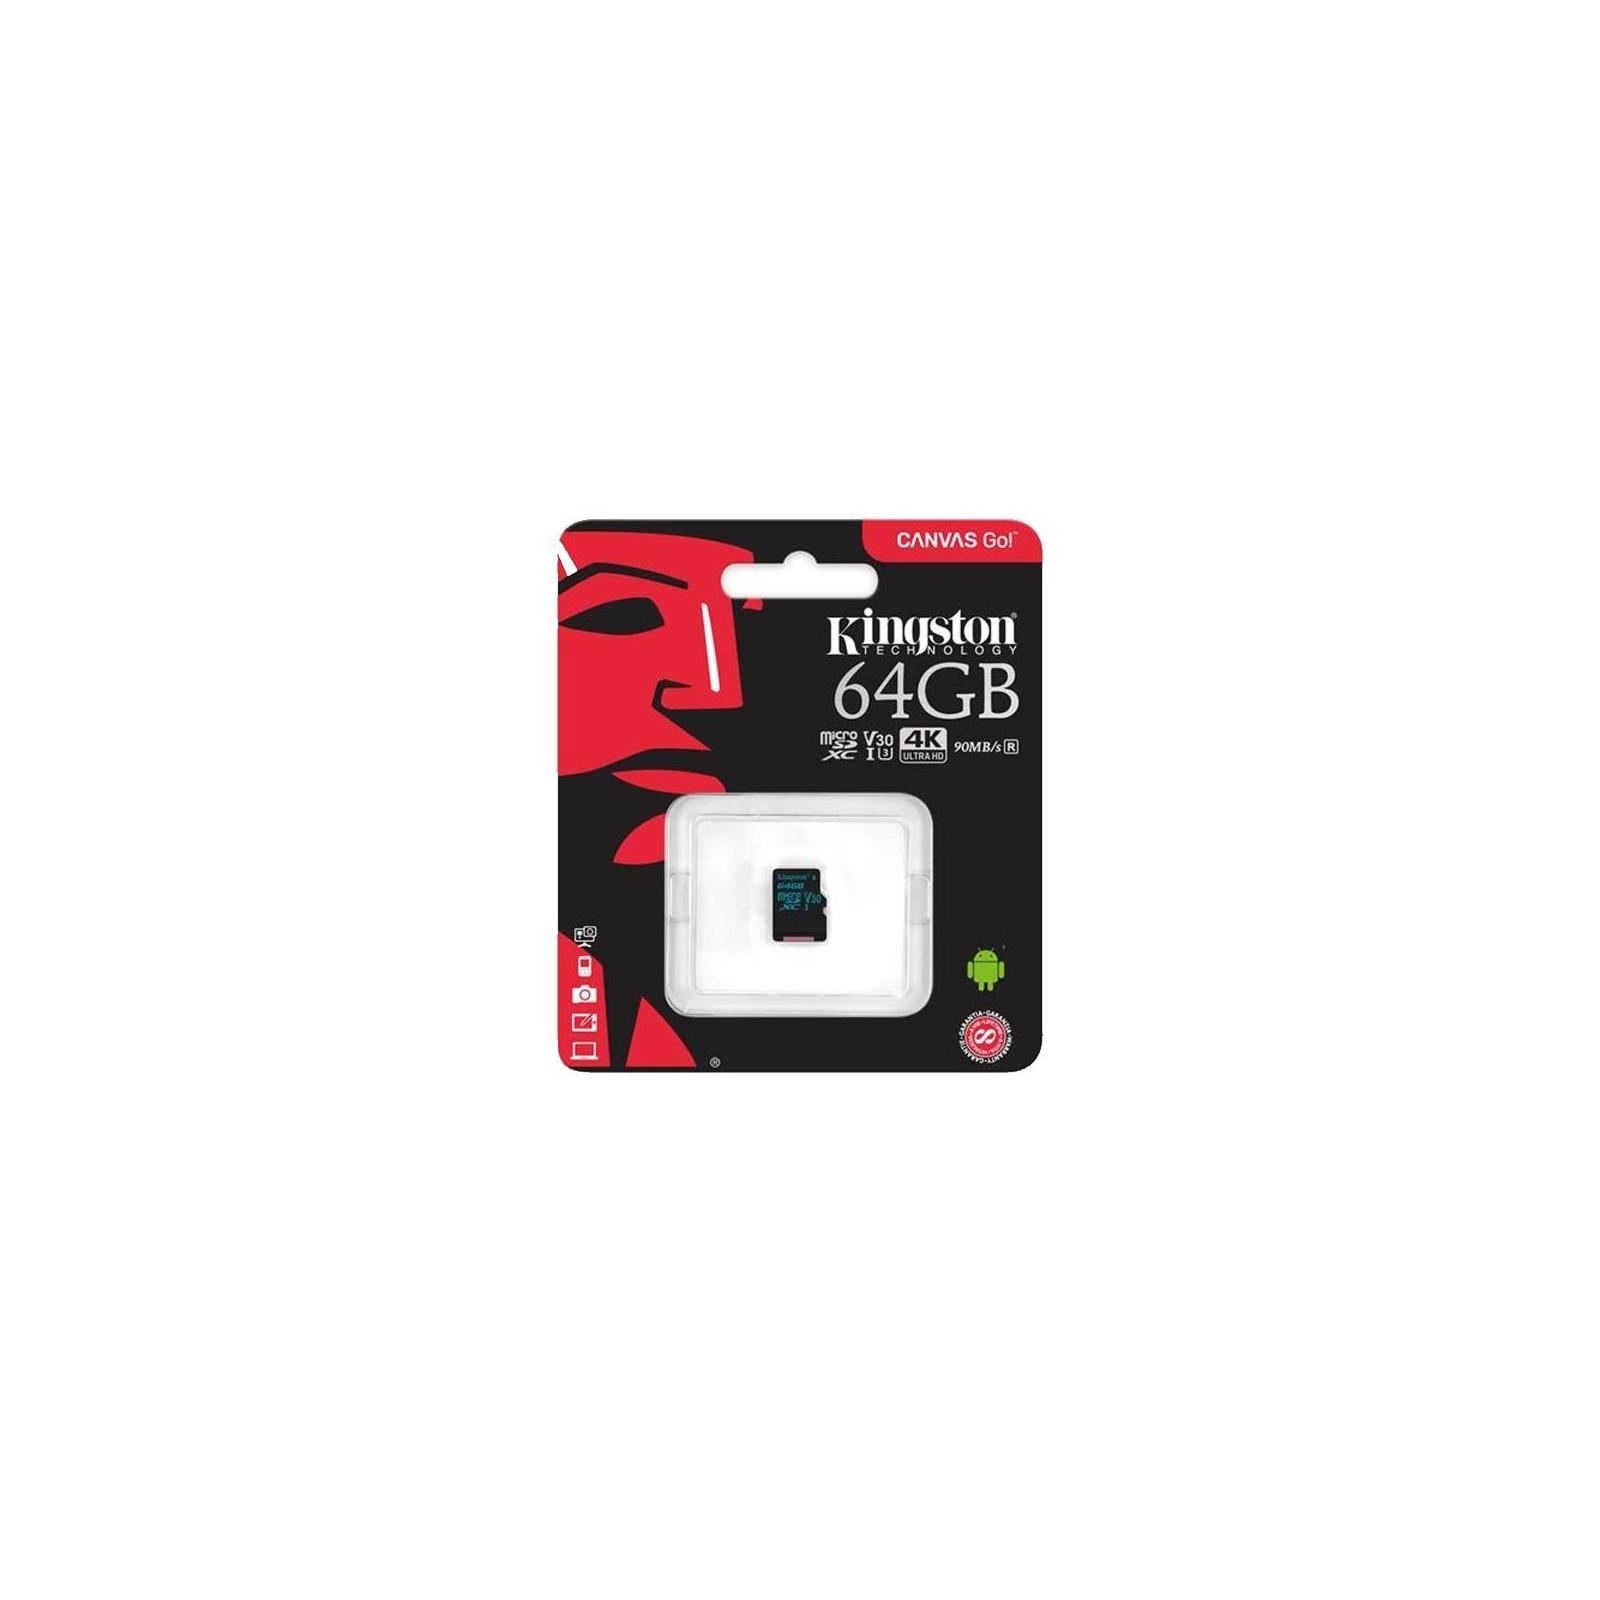 Карта памяти Kingston 64GB microSDXC class 10 UHS-I U3 Canvas Go (SDCG2/64GBSP) изображение 2